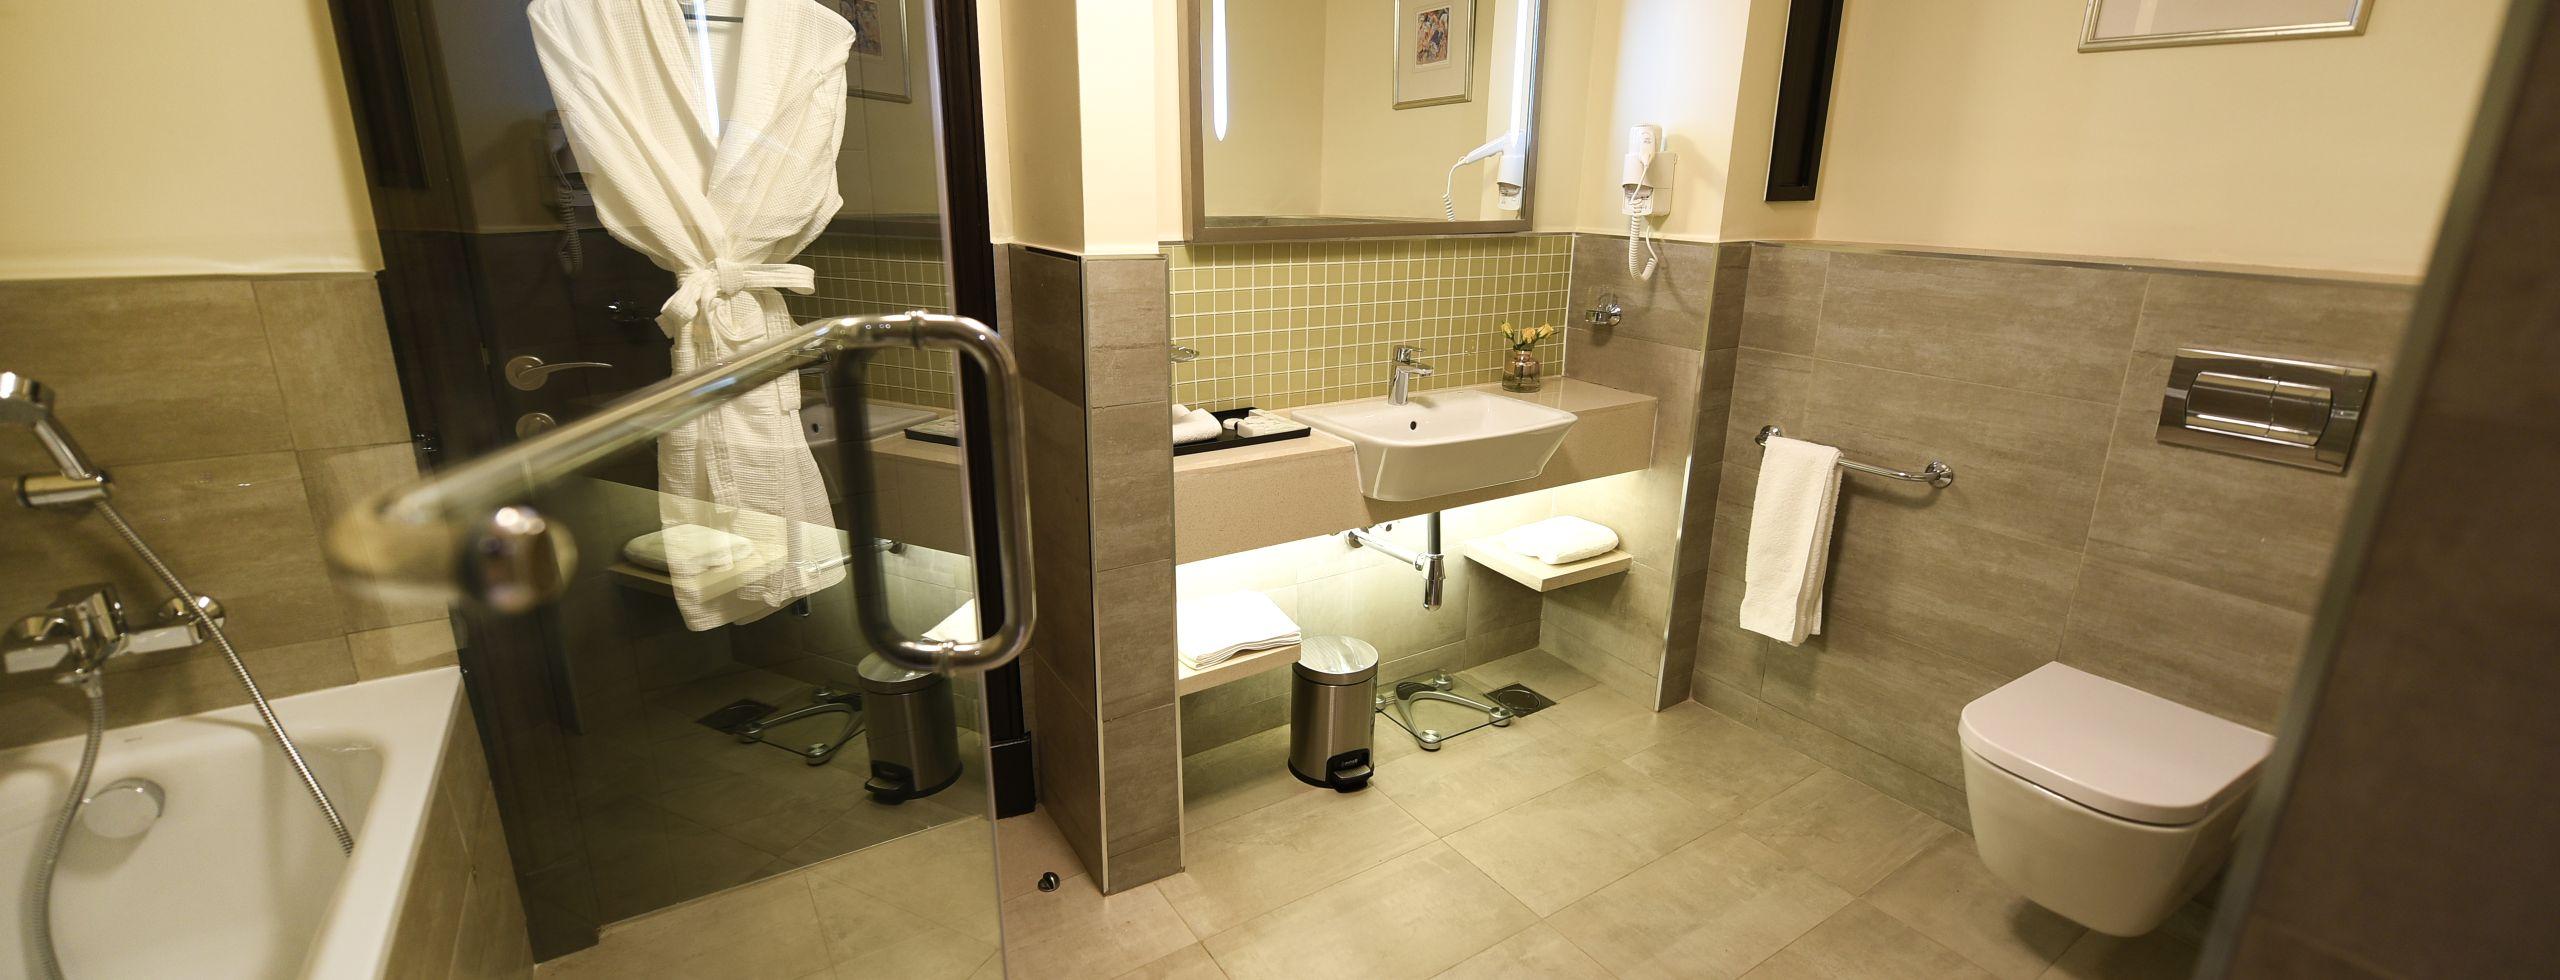 Accommodation three bed 4 bathroom